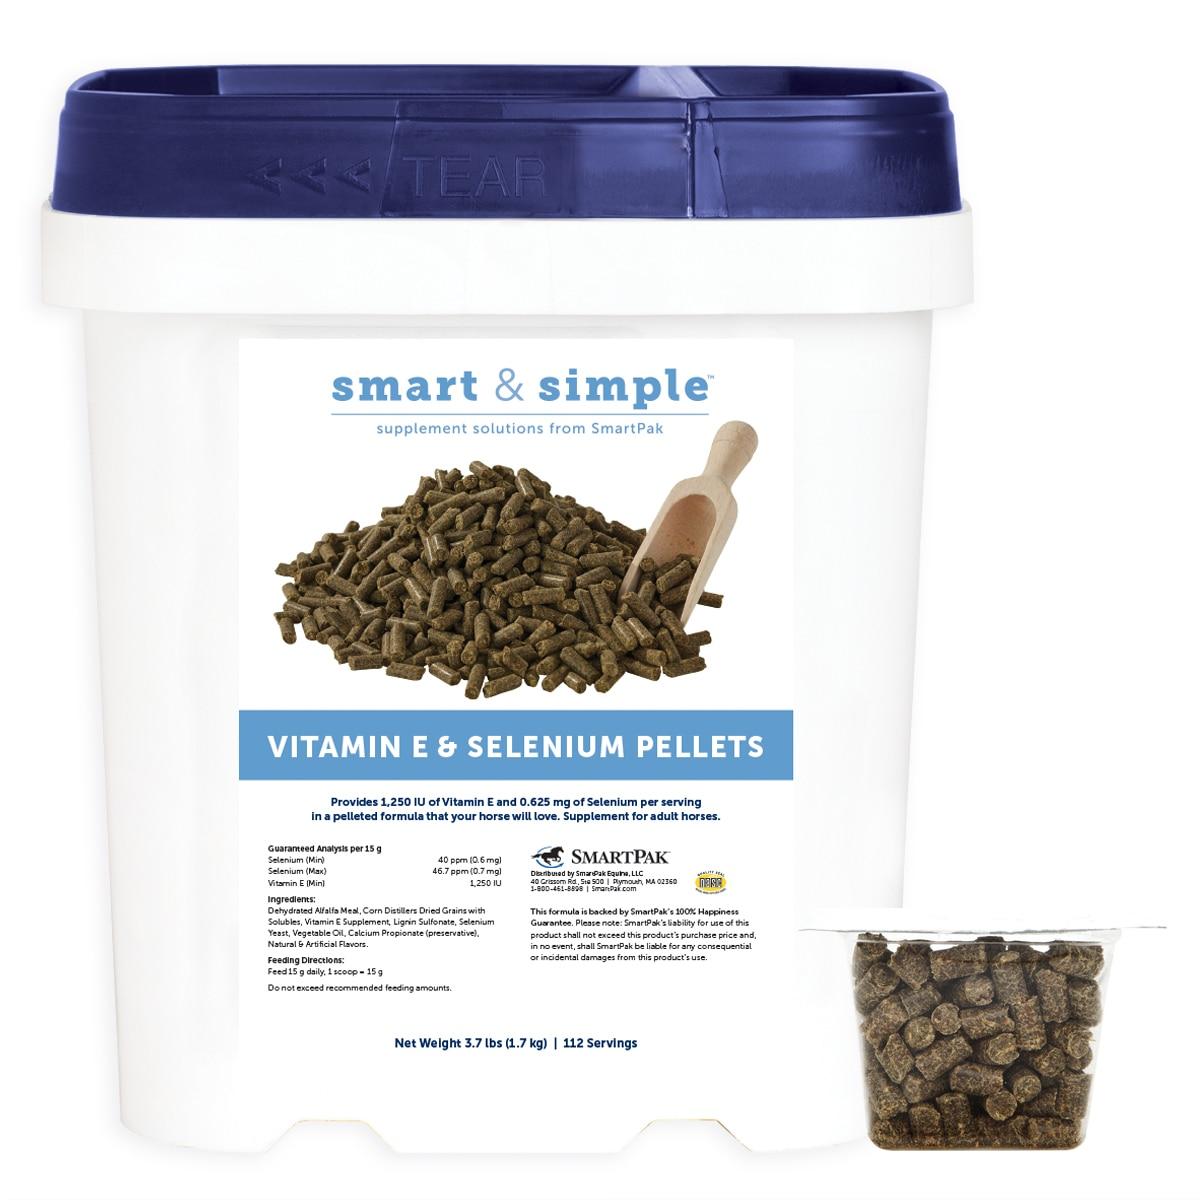 Vitamin E & Selenium Pellets by SmartPak